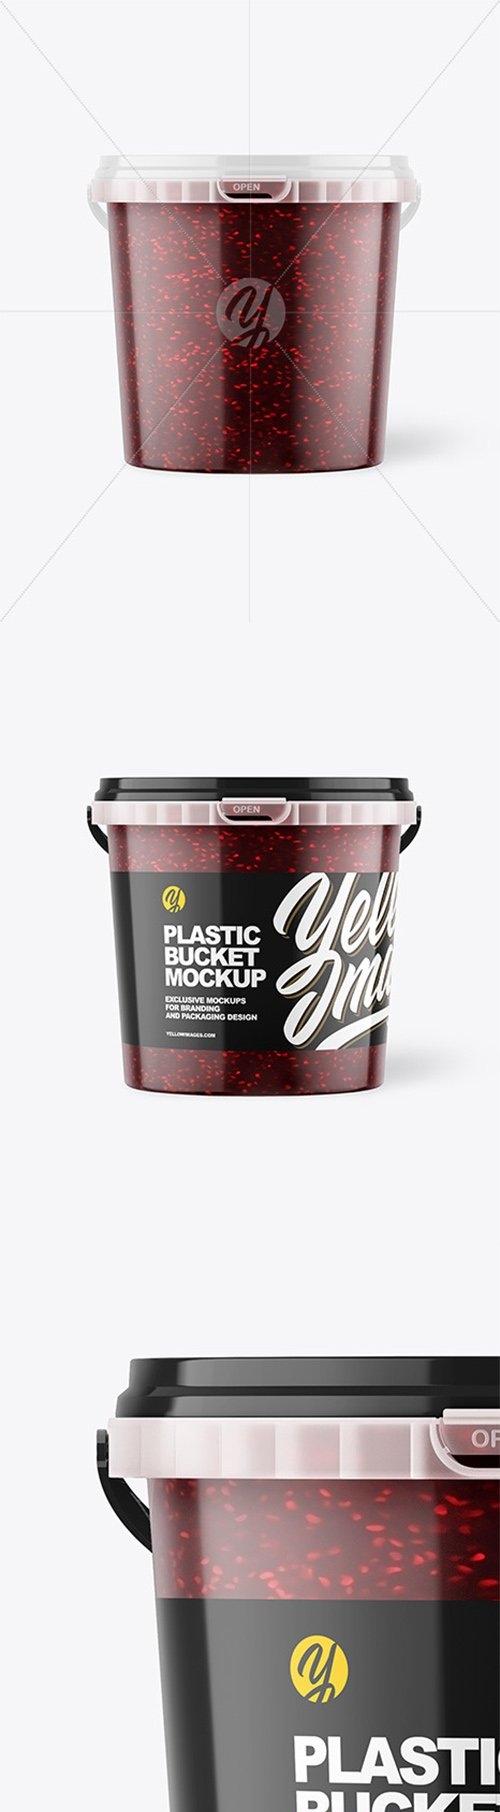 Plastic Bucket with Raspberry Jam Mockup 66489